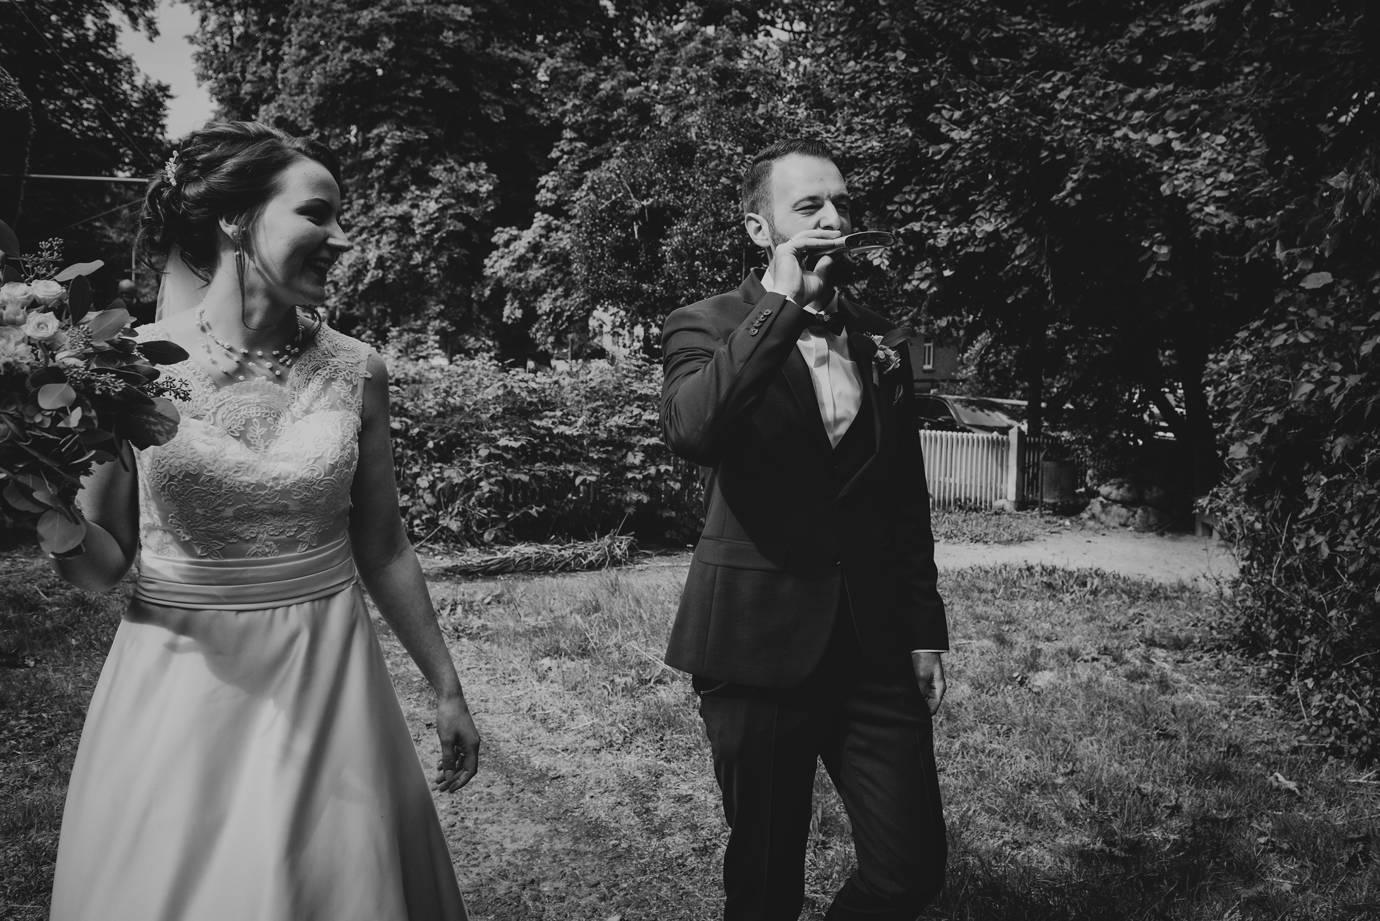 hochzeitsfotograf neu helgoland worpswede 099 - Marisa+Pascal